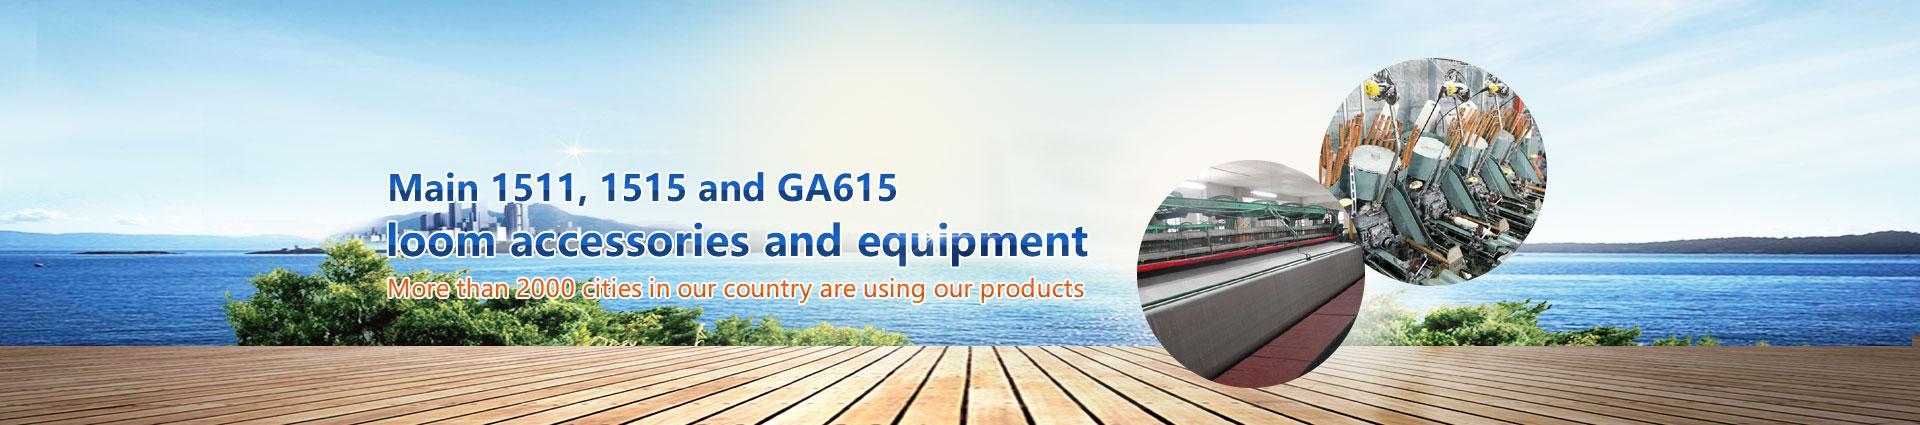 Xinxiang City Xinda Textile Machinery Parts Co. Ltd